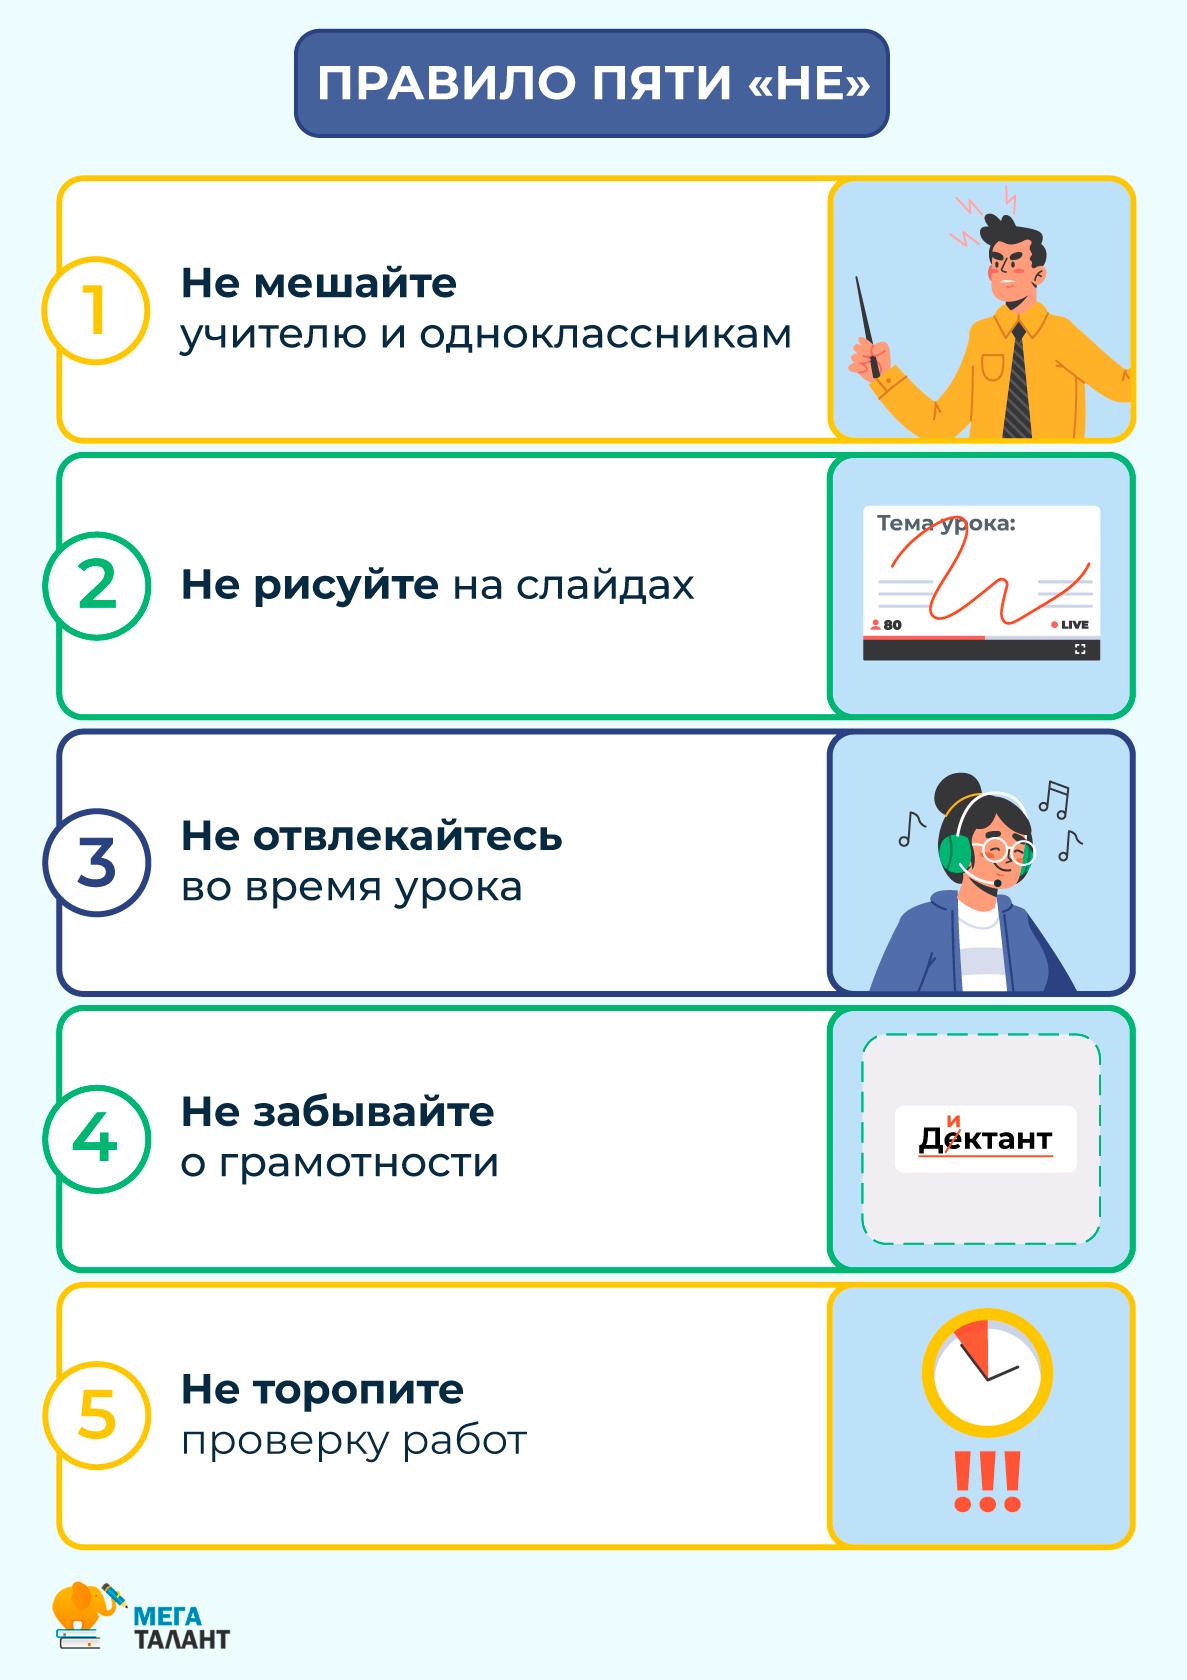 4.Правила-пяти-не